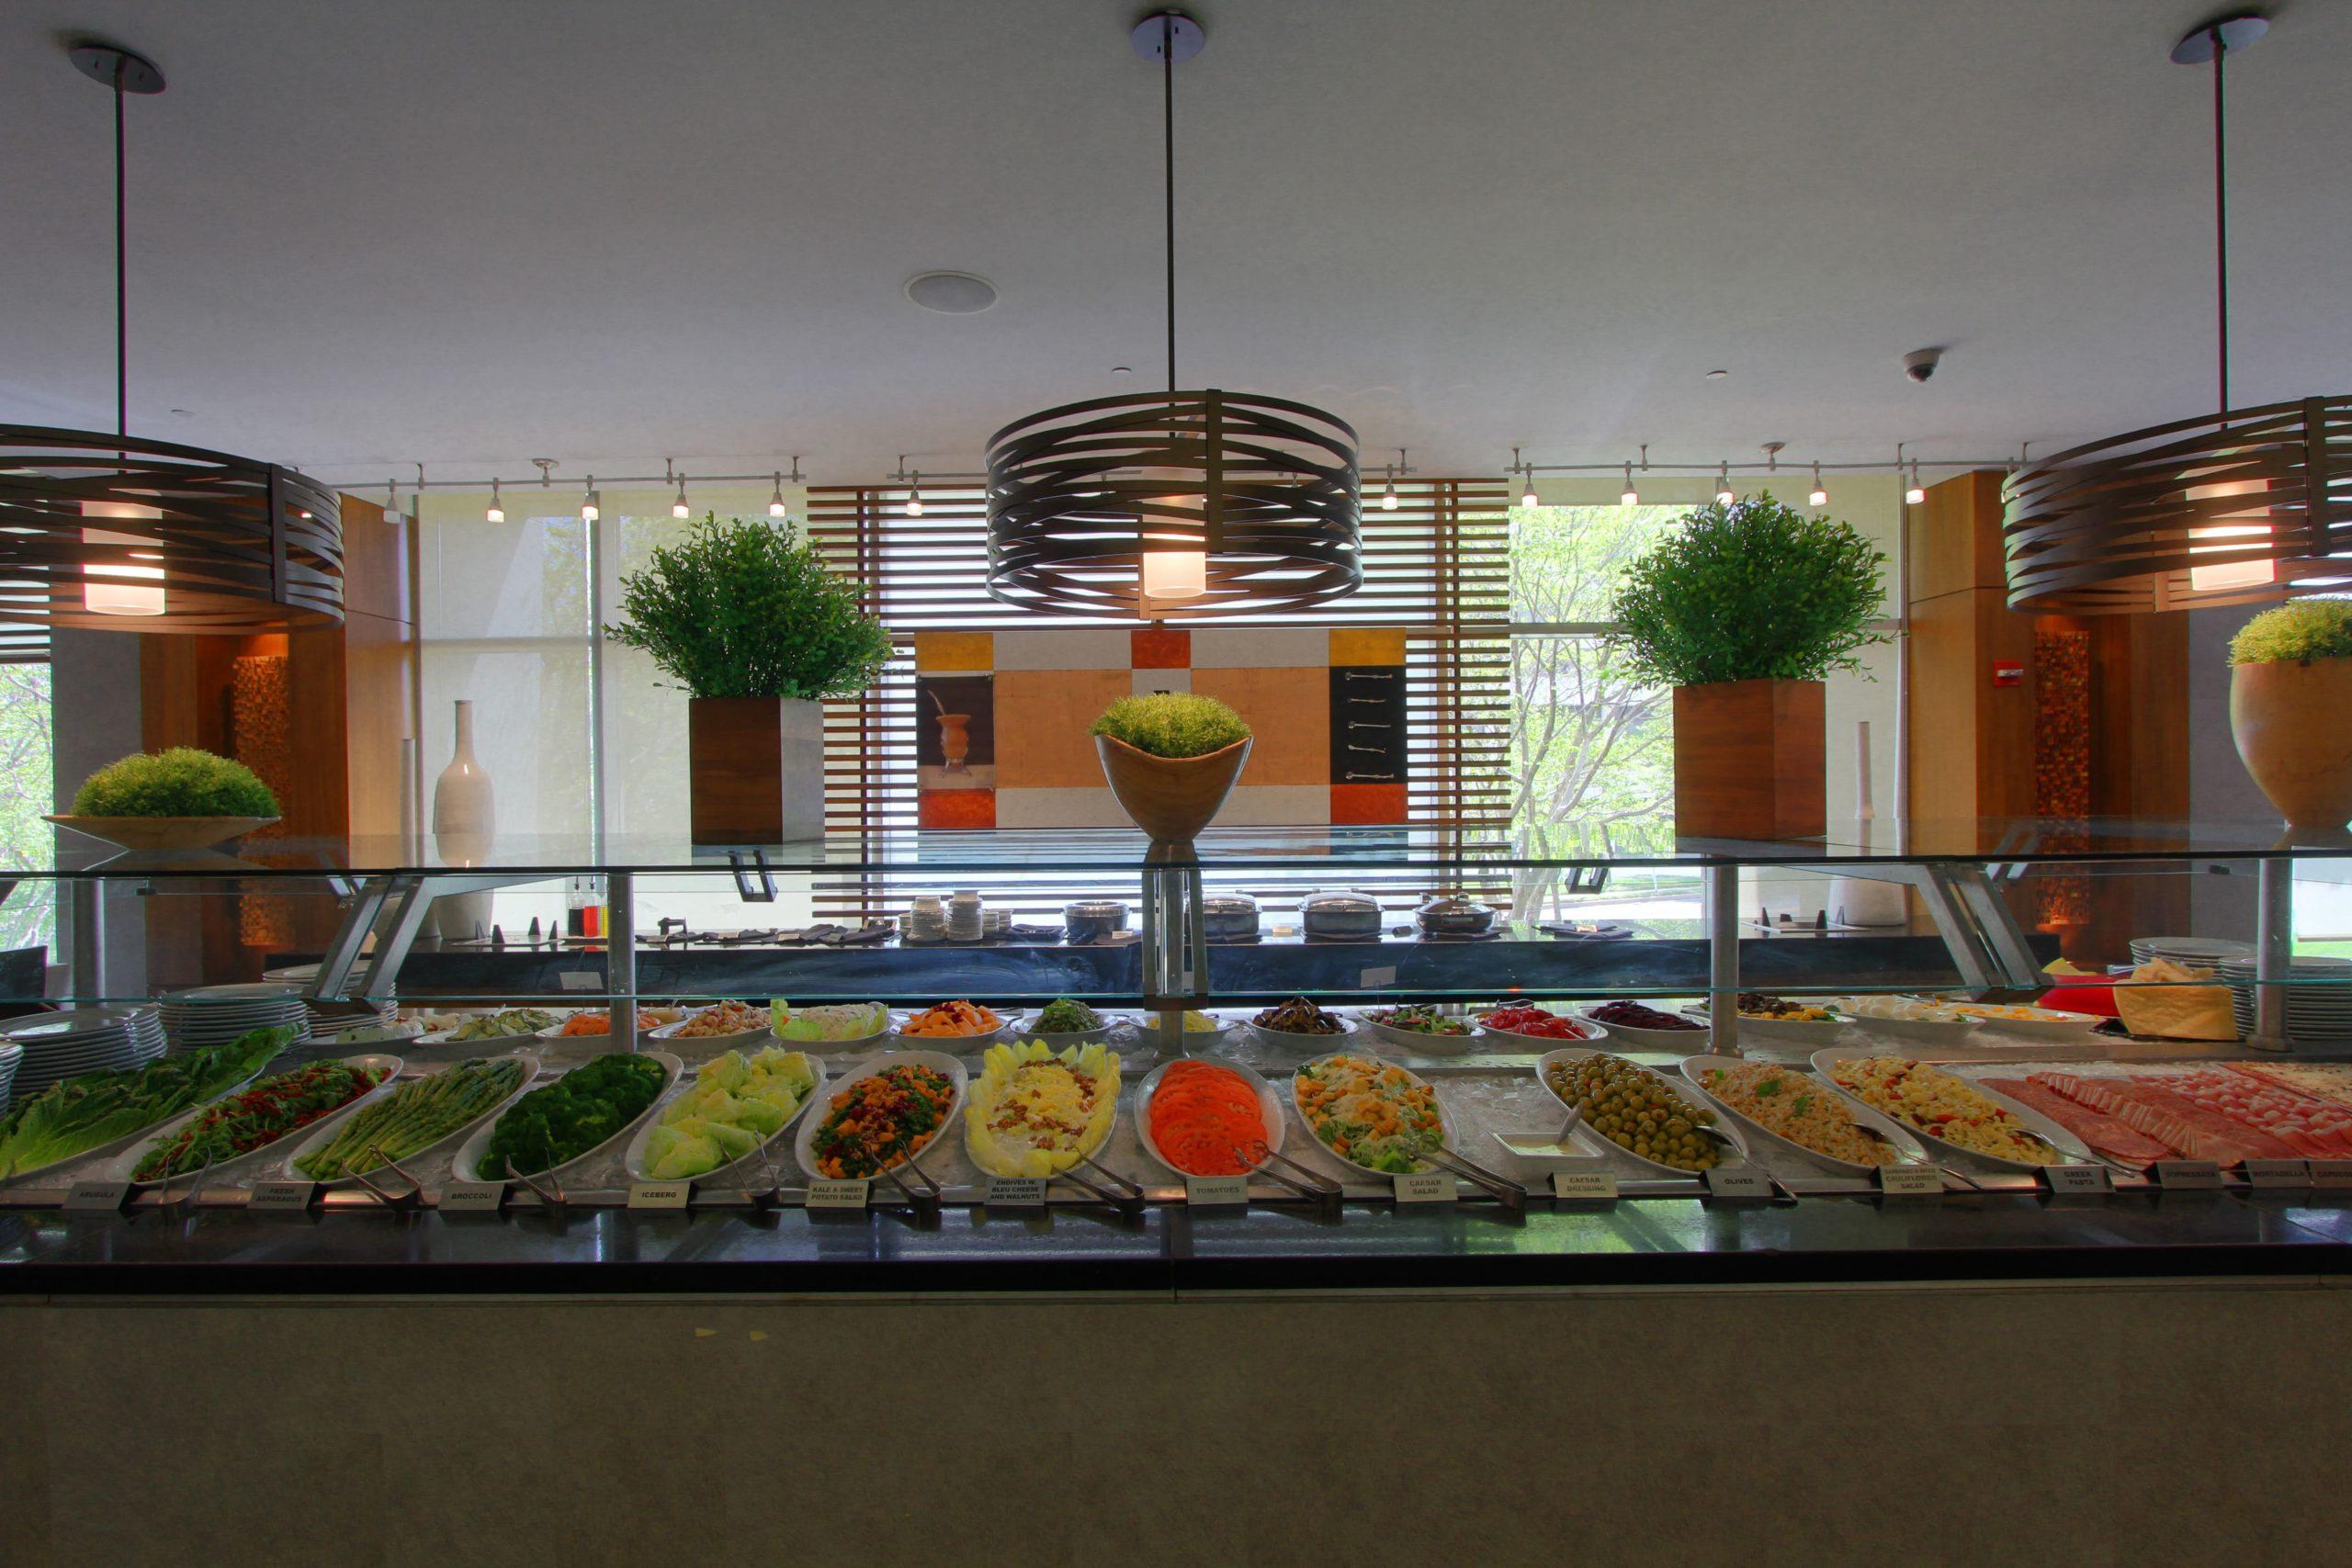 TYS_Salad Bar detail 1